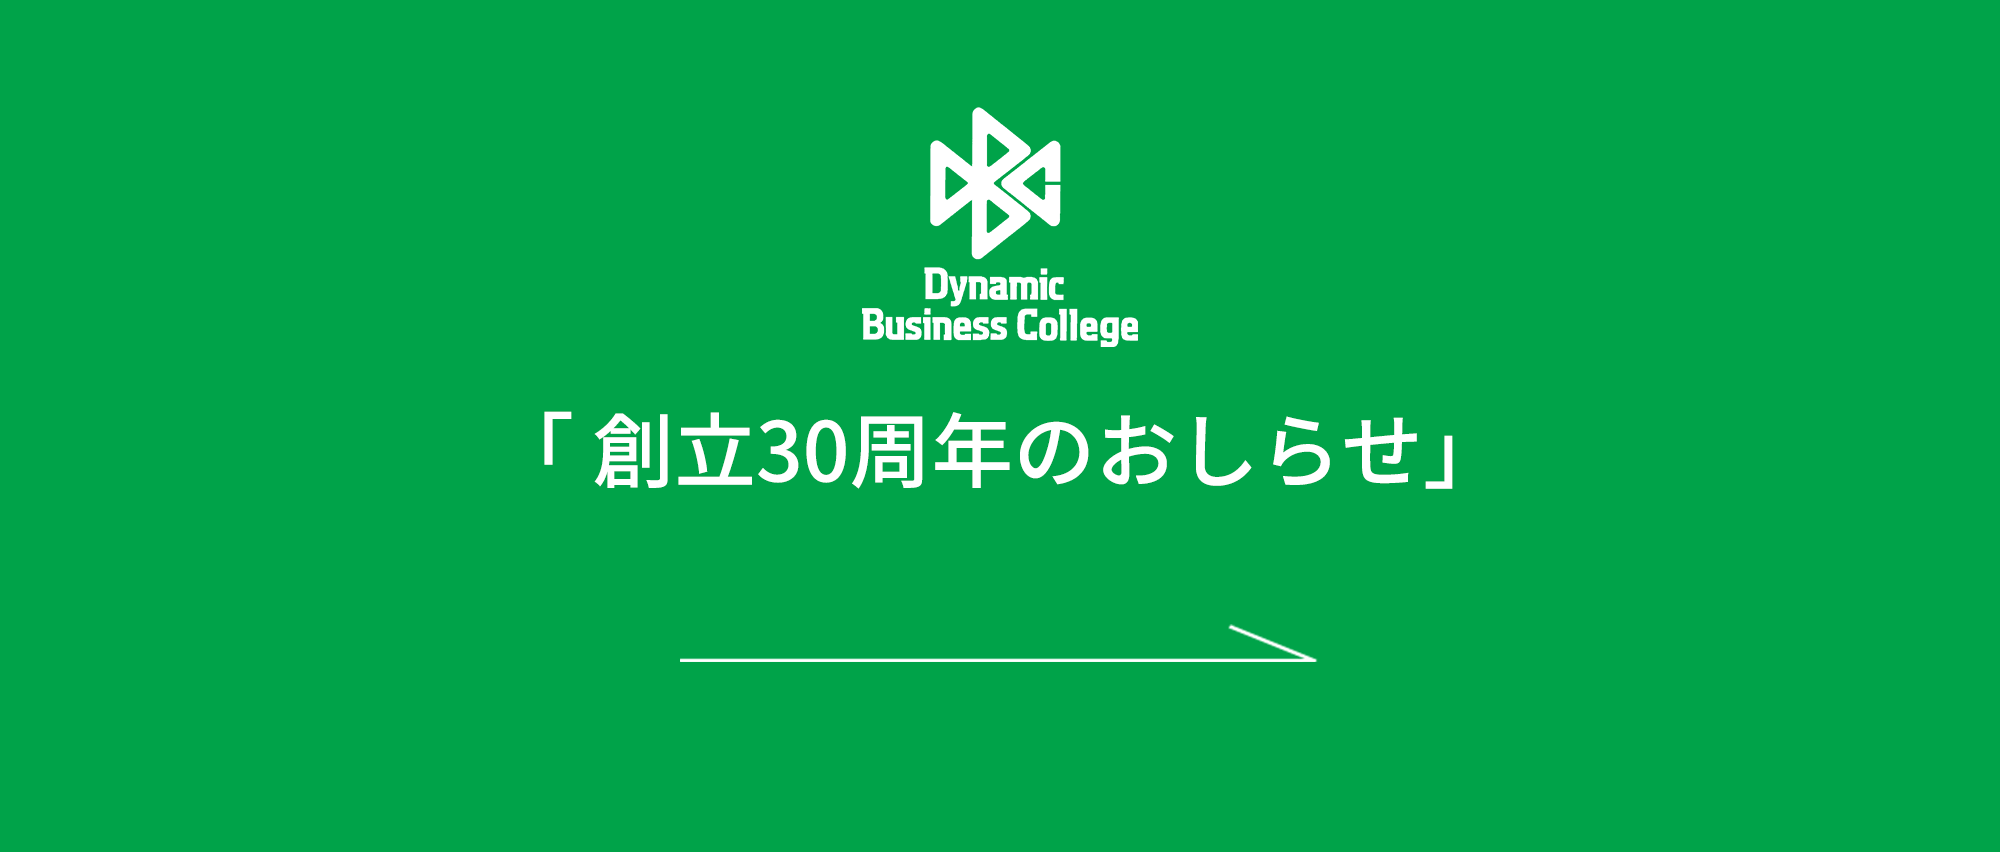 DBC information